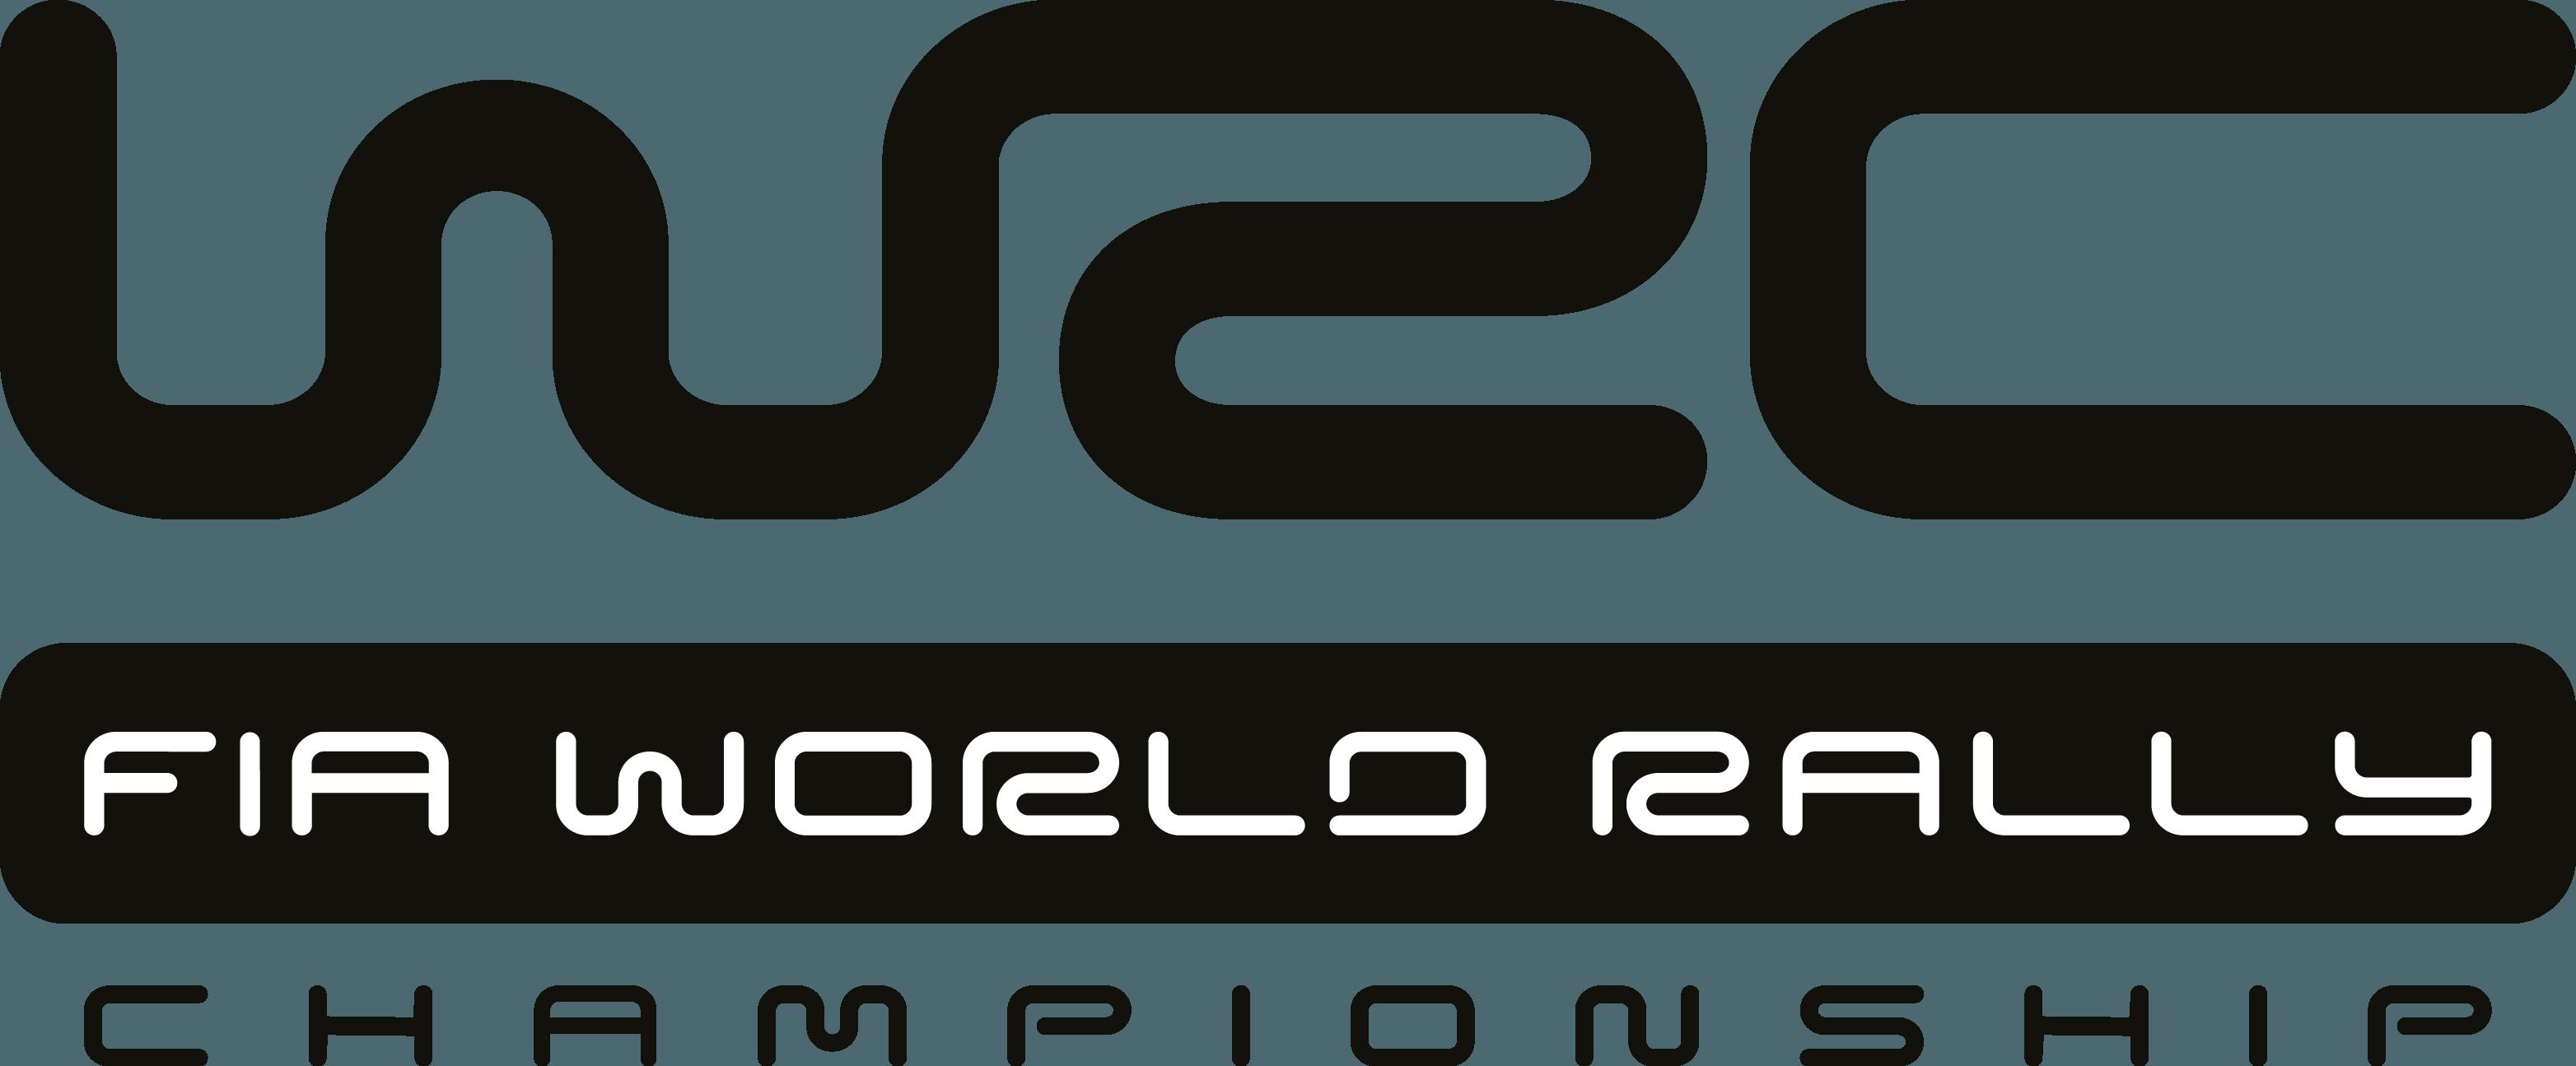 wrc-world-rally-championship-logo